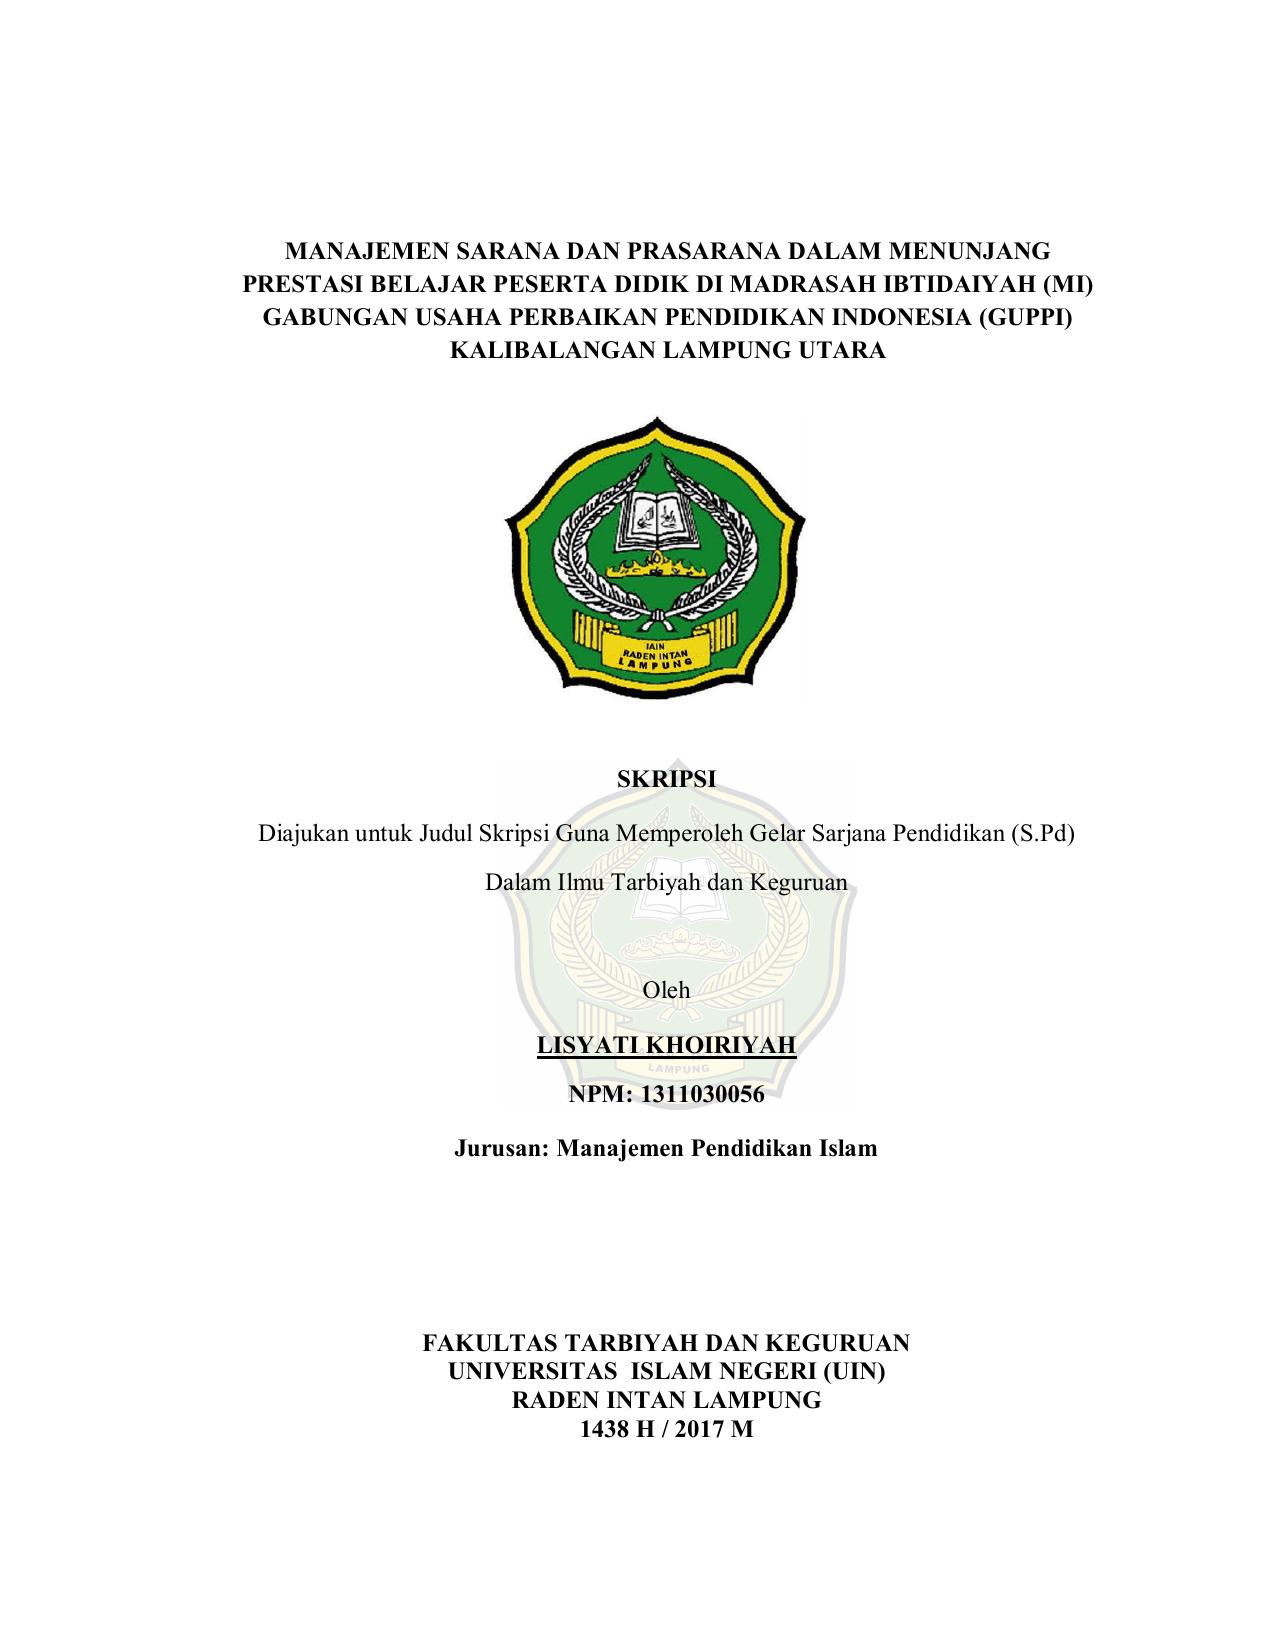 Contoh Judul Skripsi Manajemen Pendidikan Islam Kumpulan Berbagai Skripsi